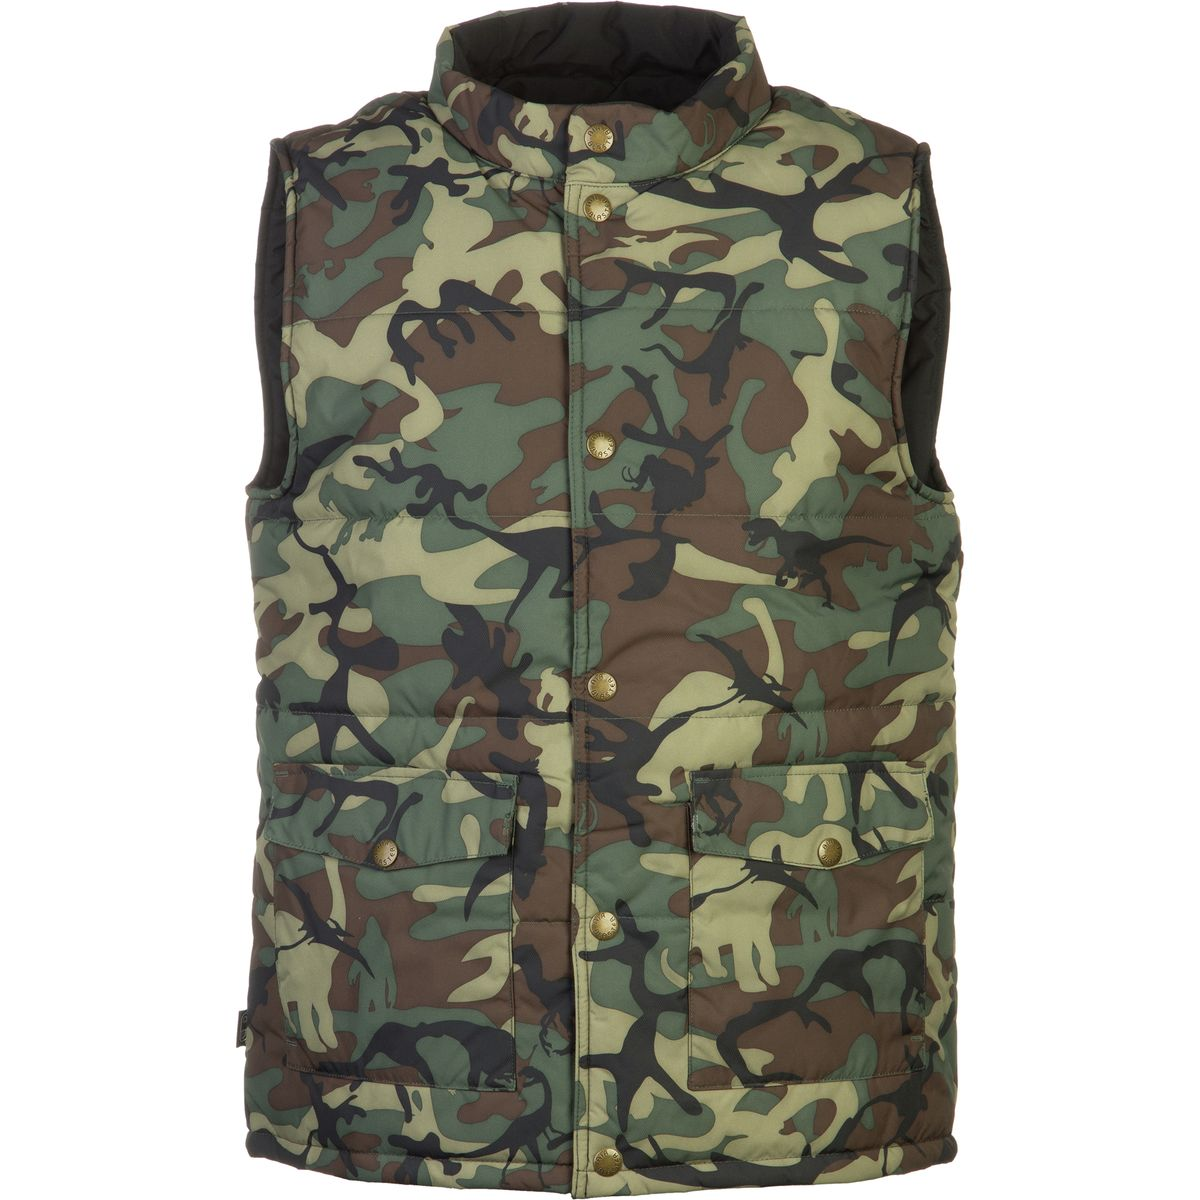 Airblaster Double Puff Vest - Men